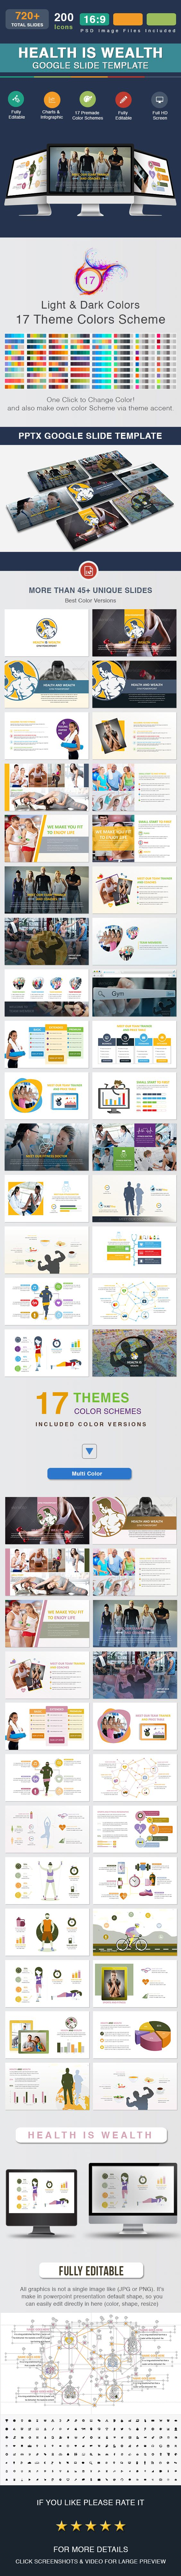 Google themes explorer - Health Is Wealth Google Slide Template